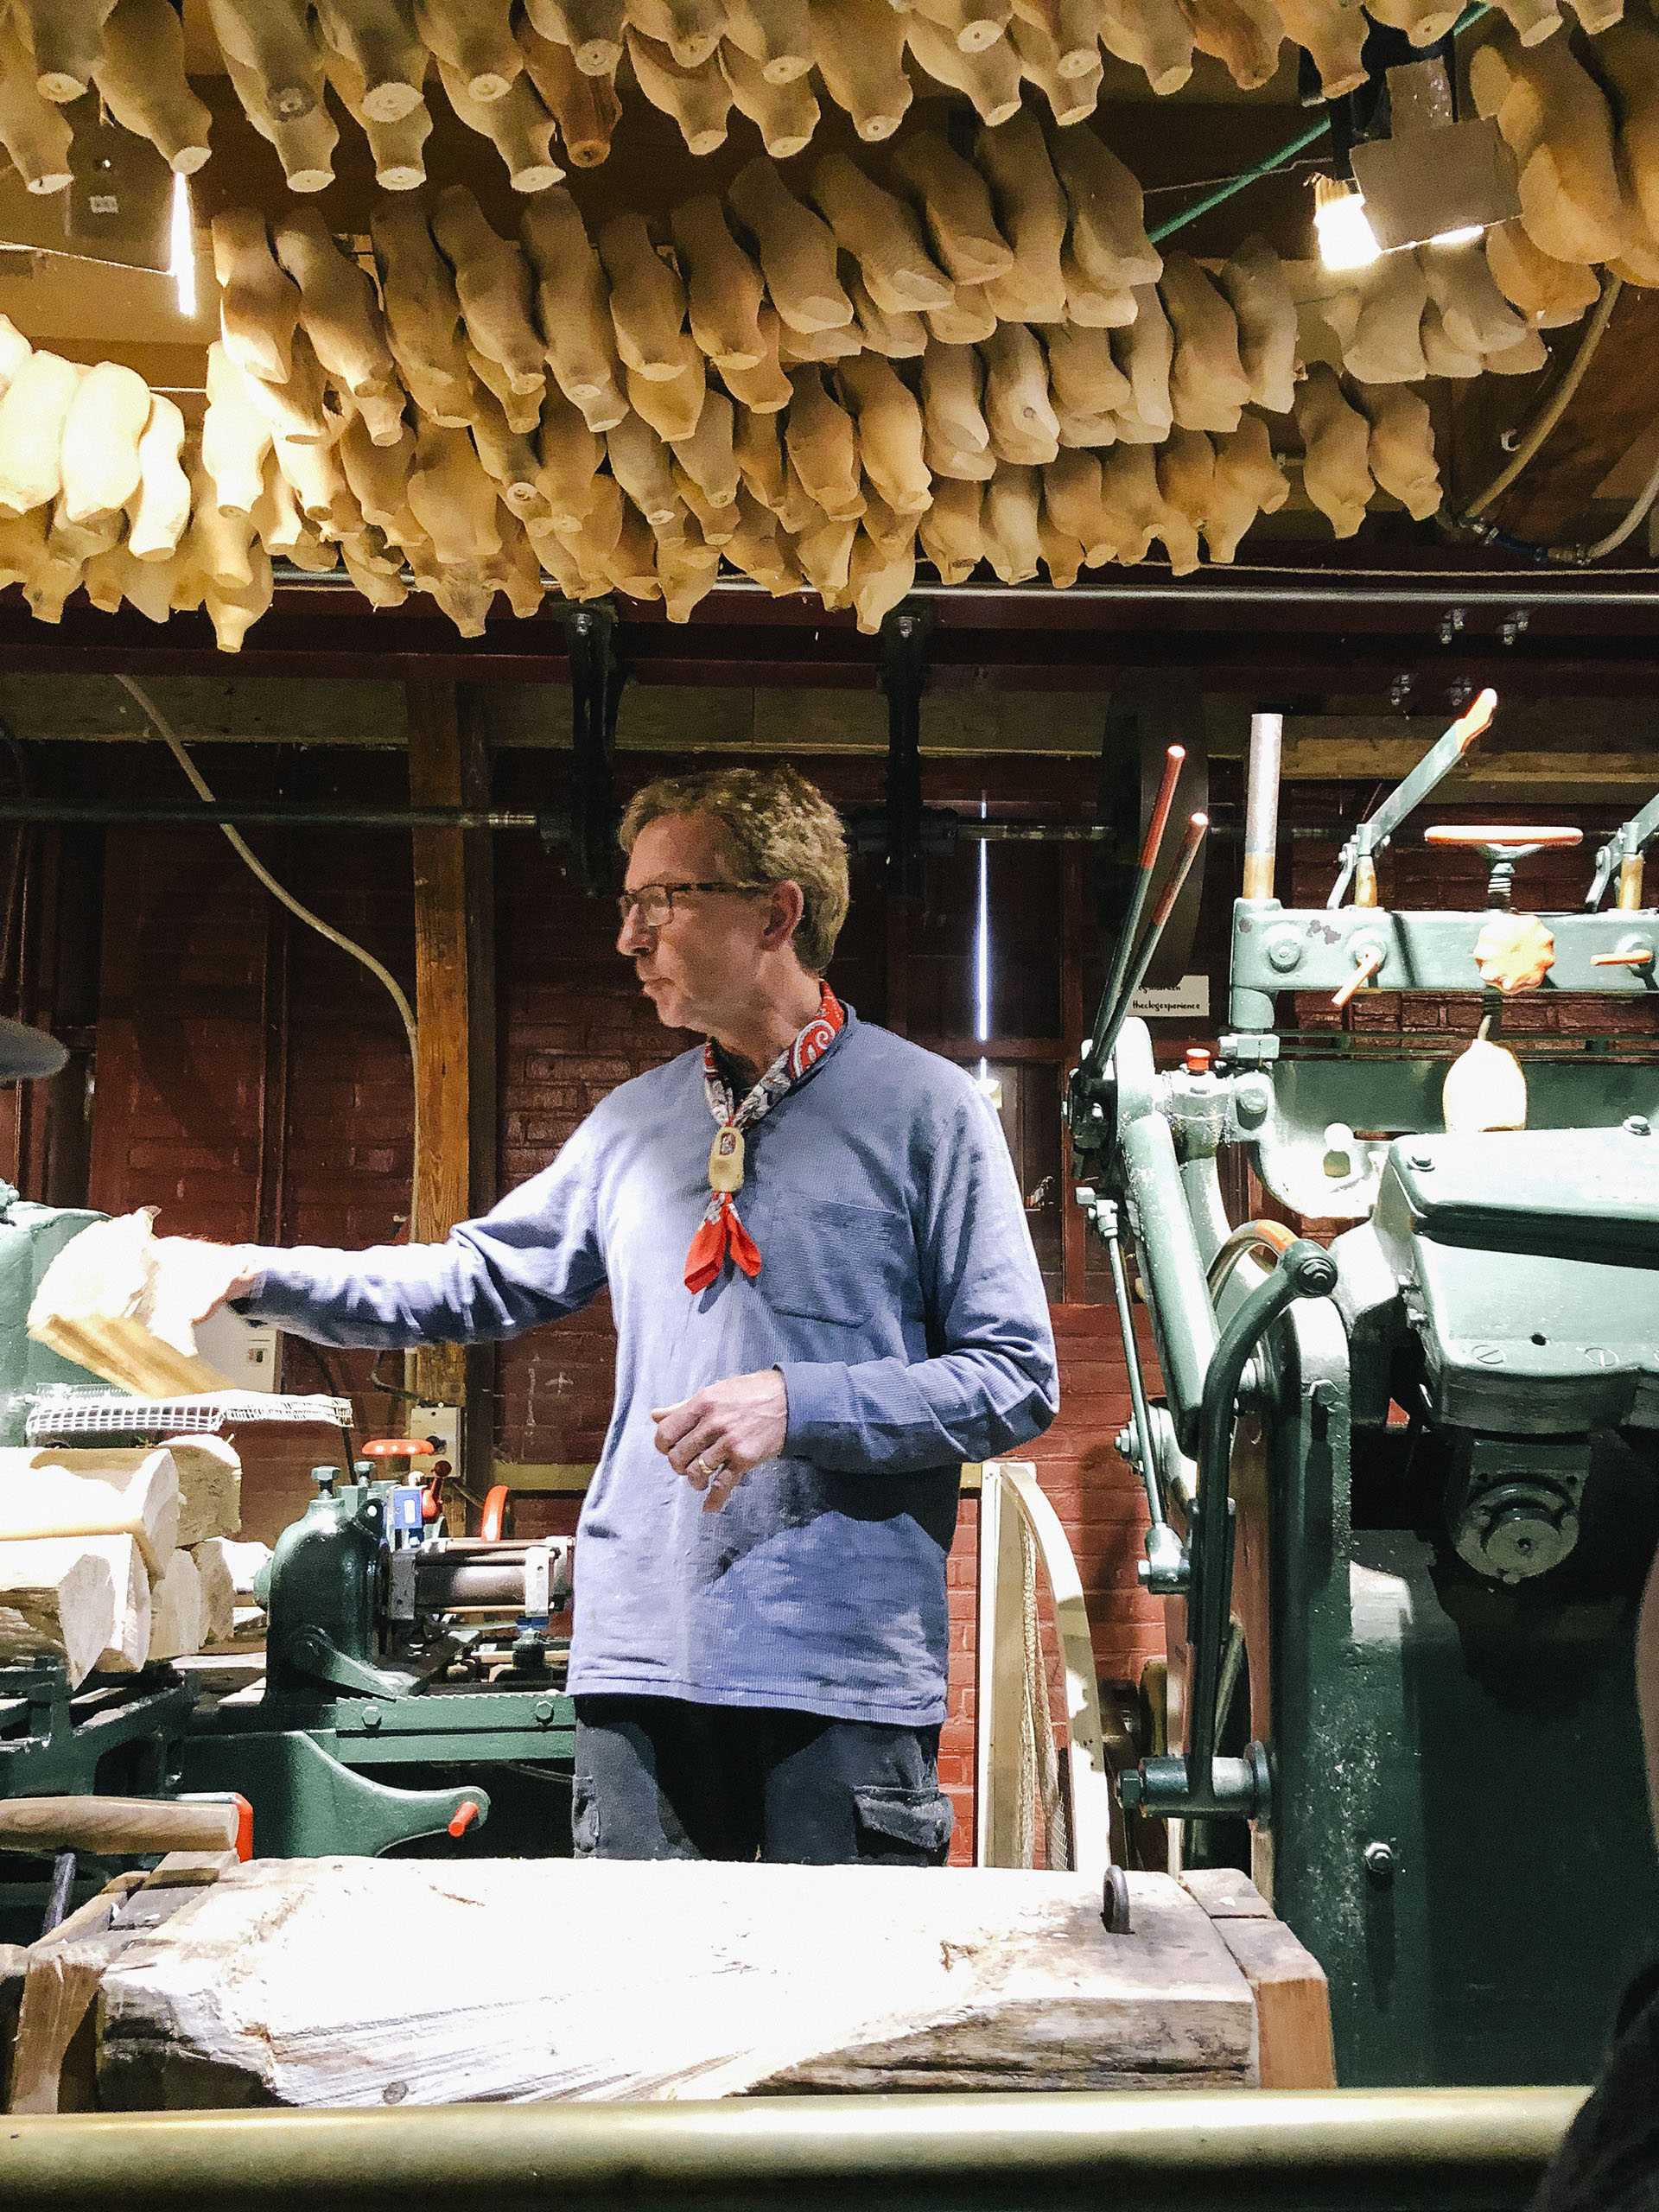 Wooden clog making at Marken